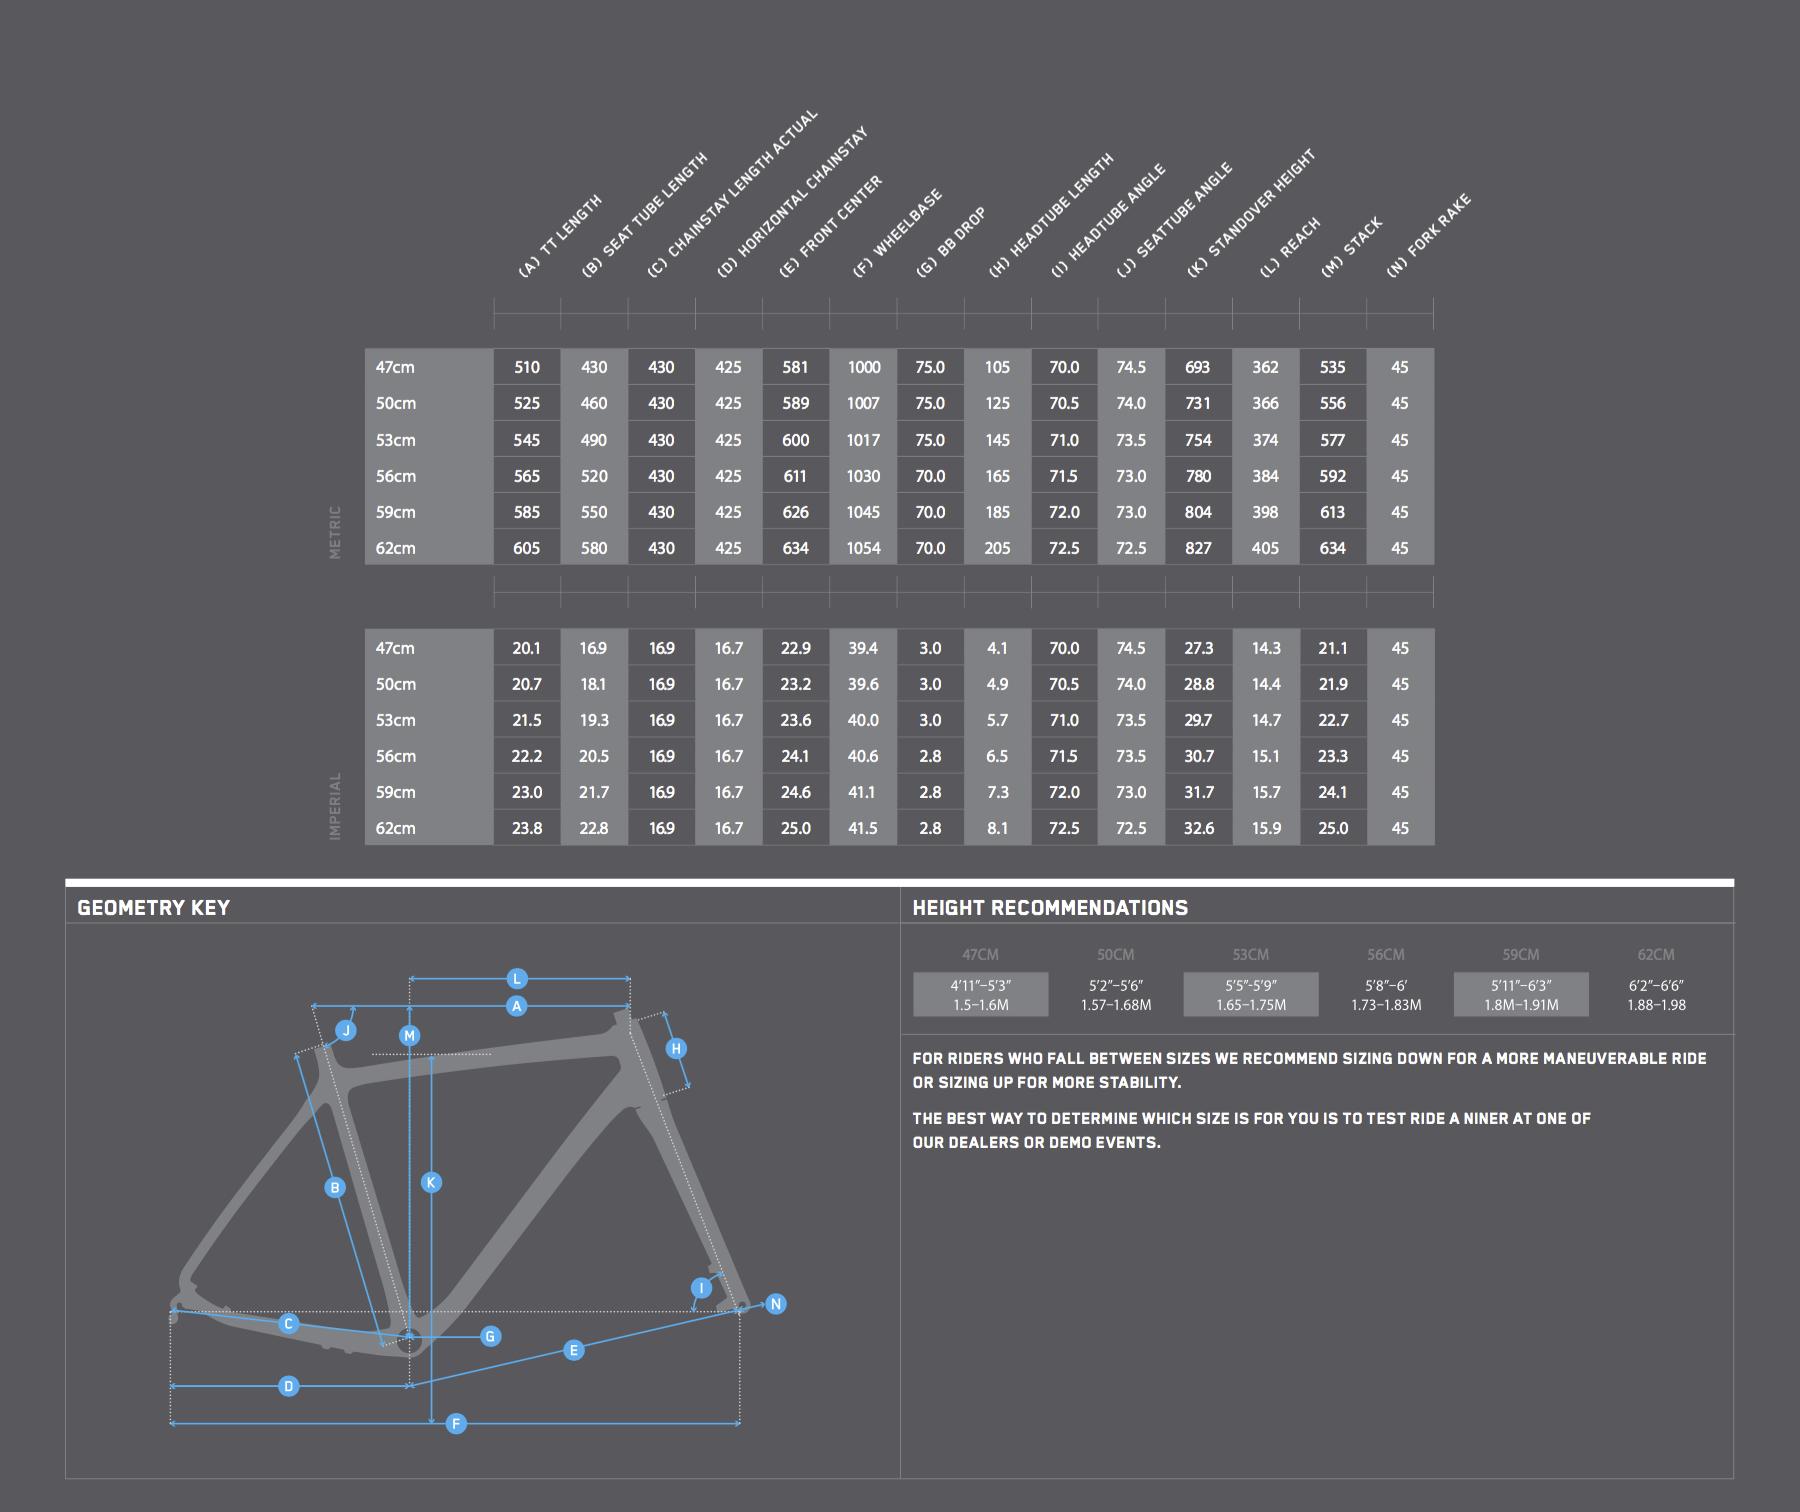 Niner RLT RDO geometry chart